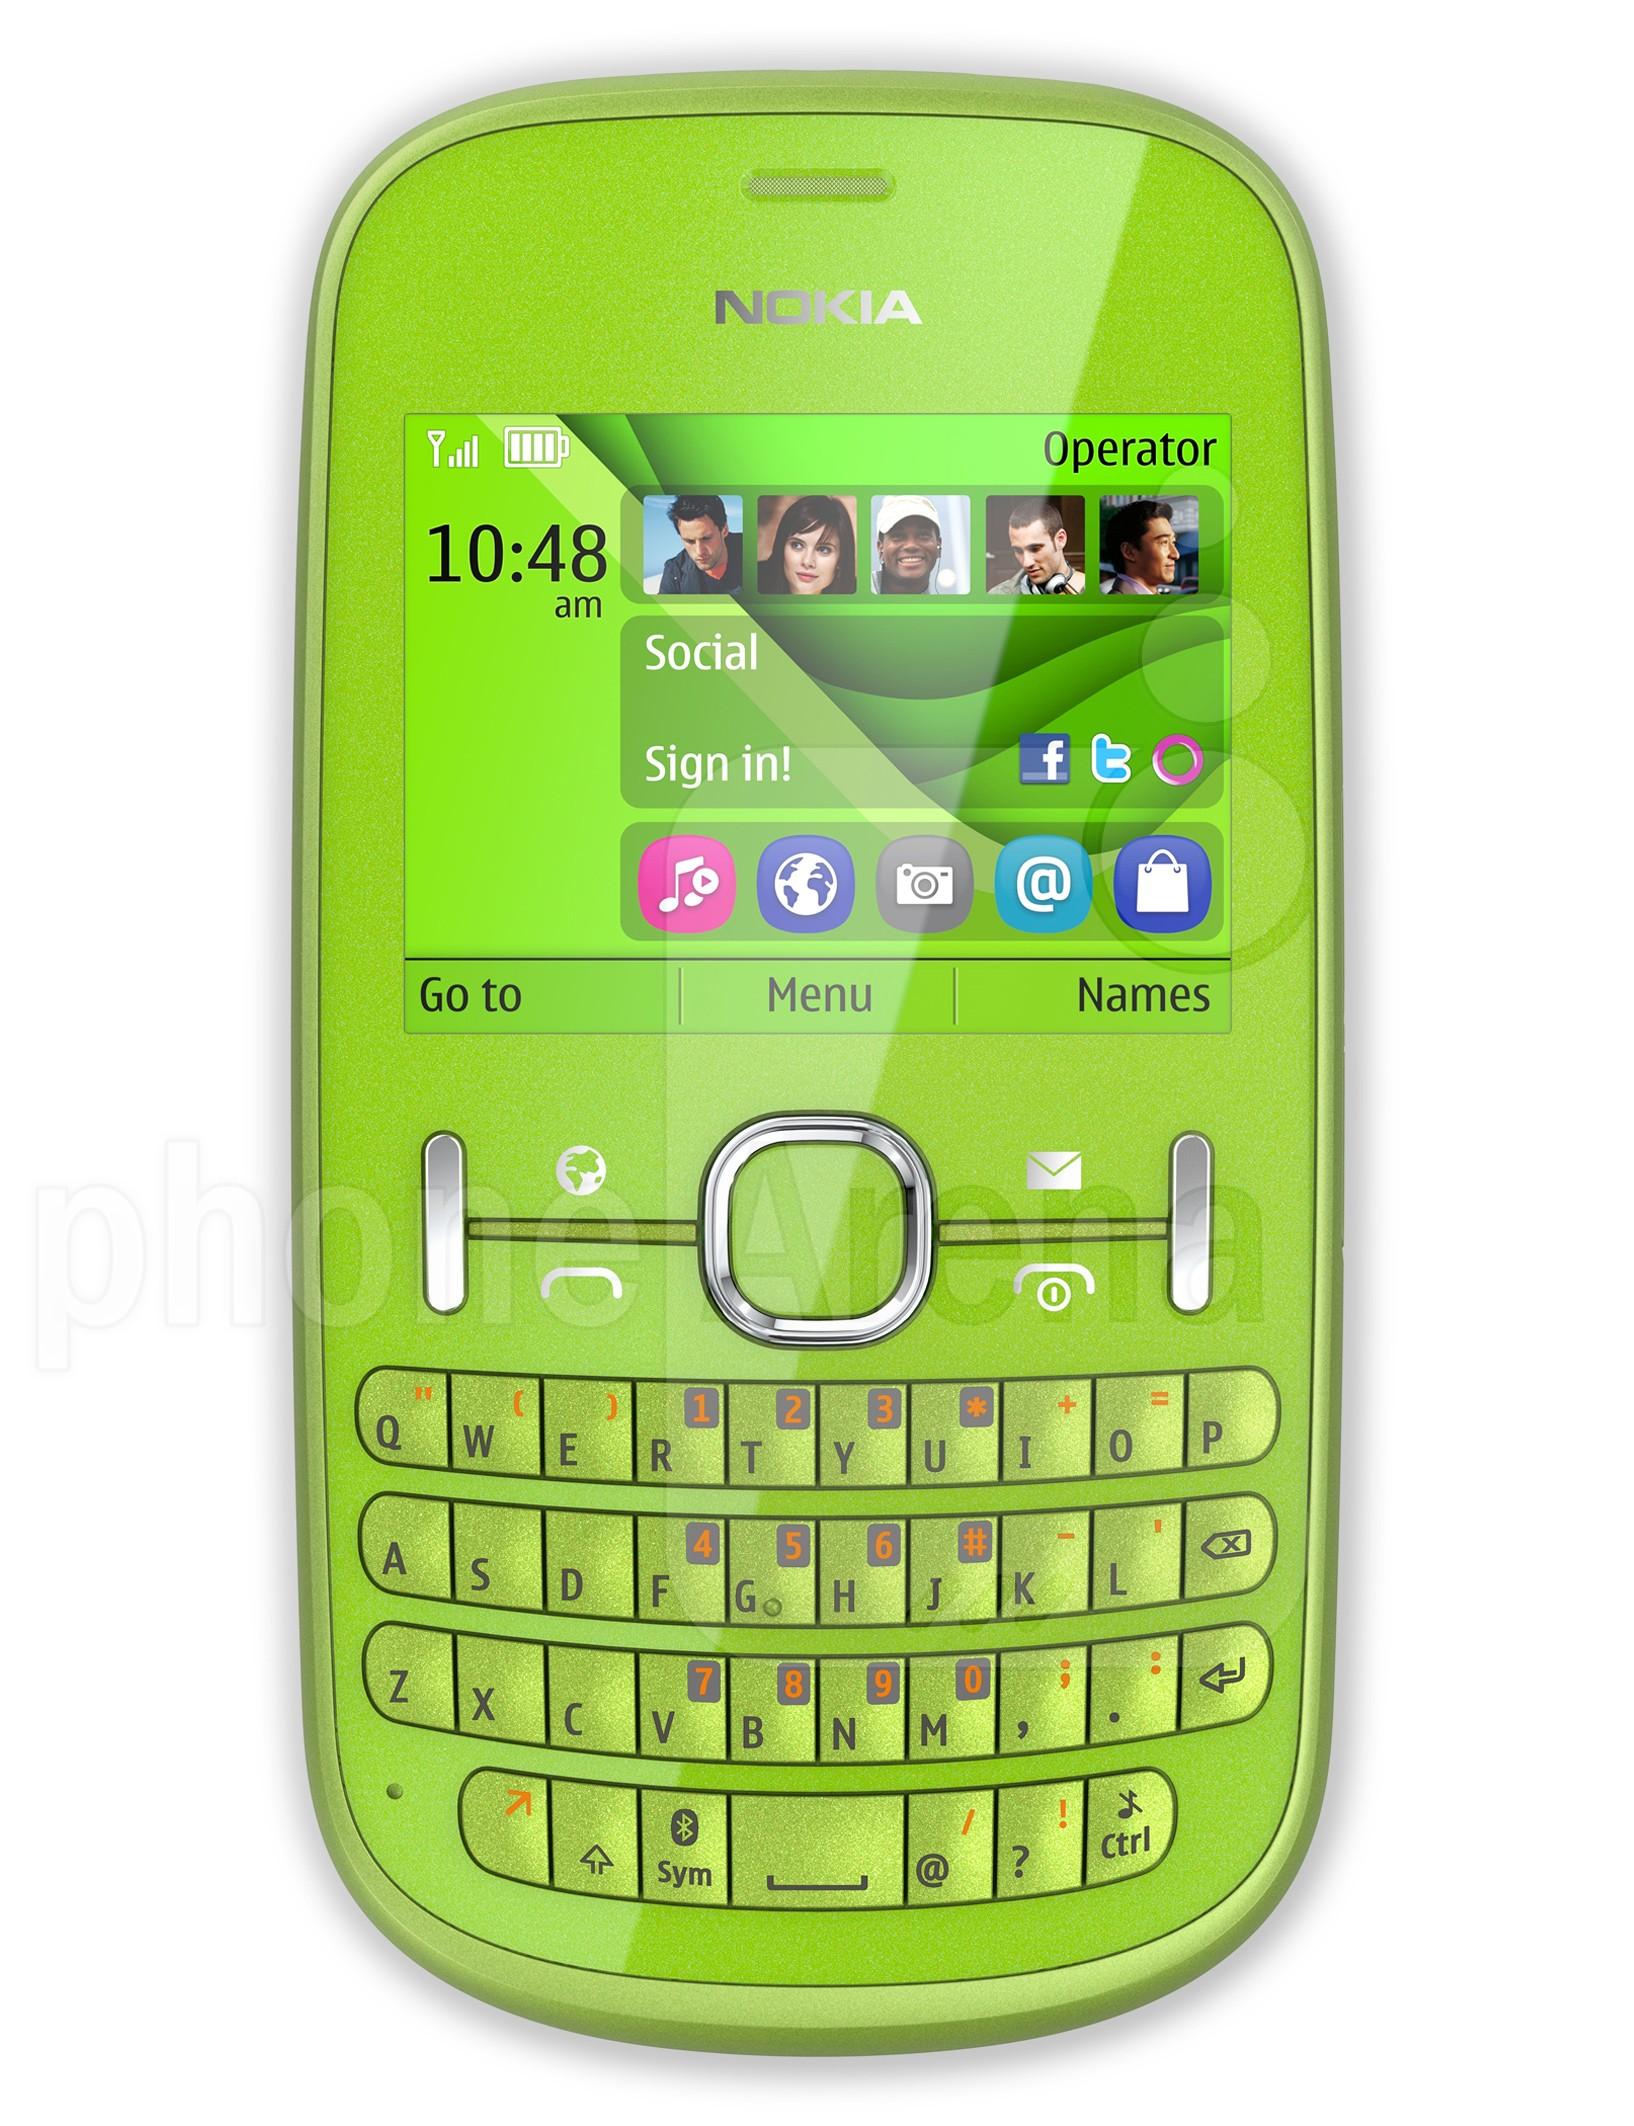 Nokia Asha 201 specs